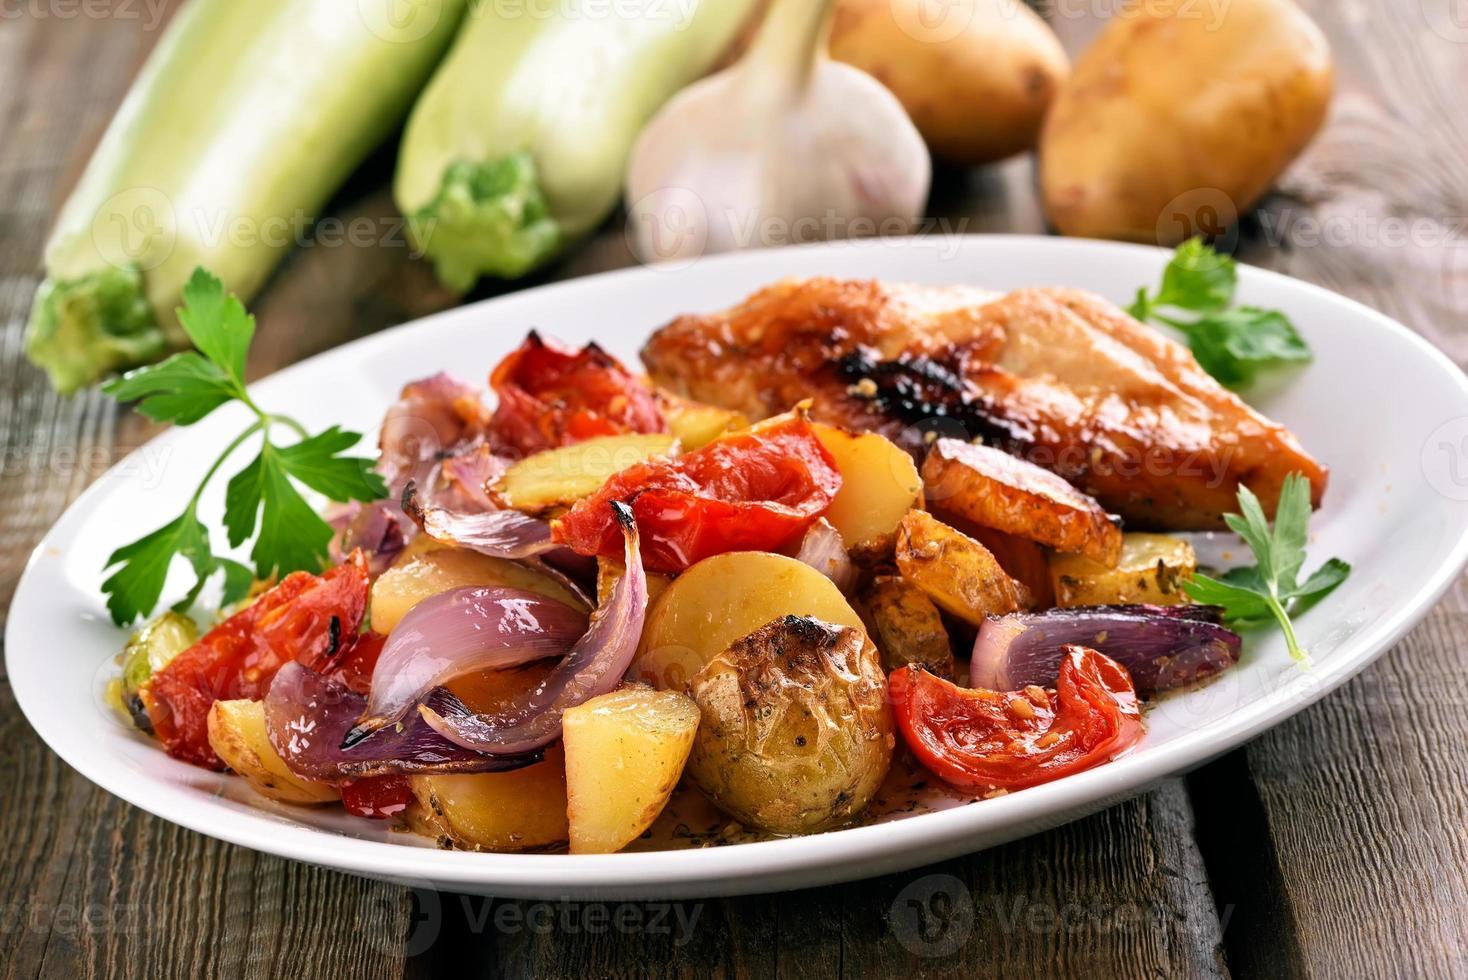 vegetales a la parrilla con pechuga de pollo foto